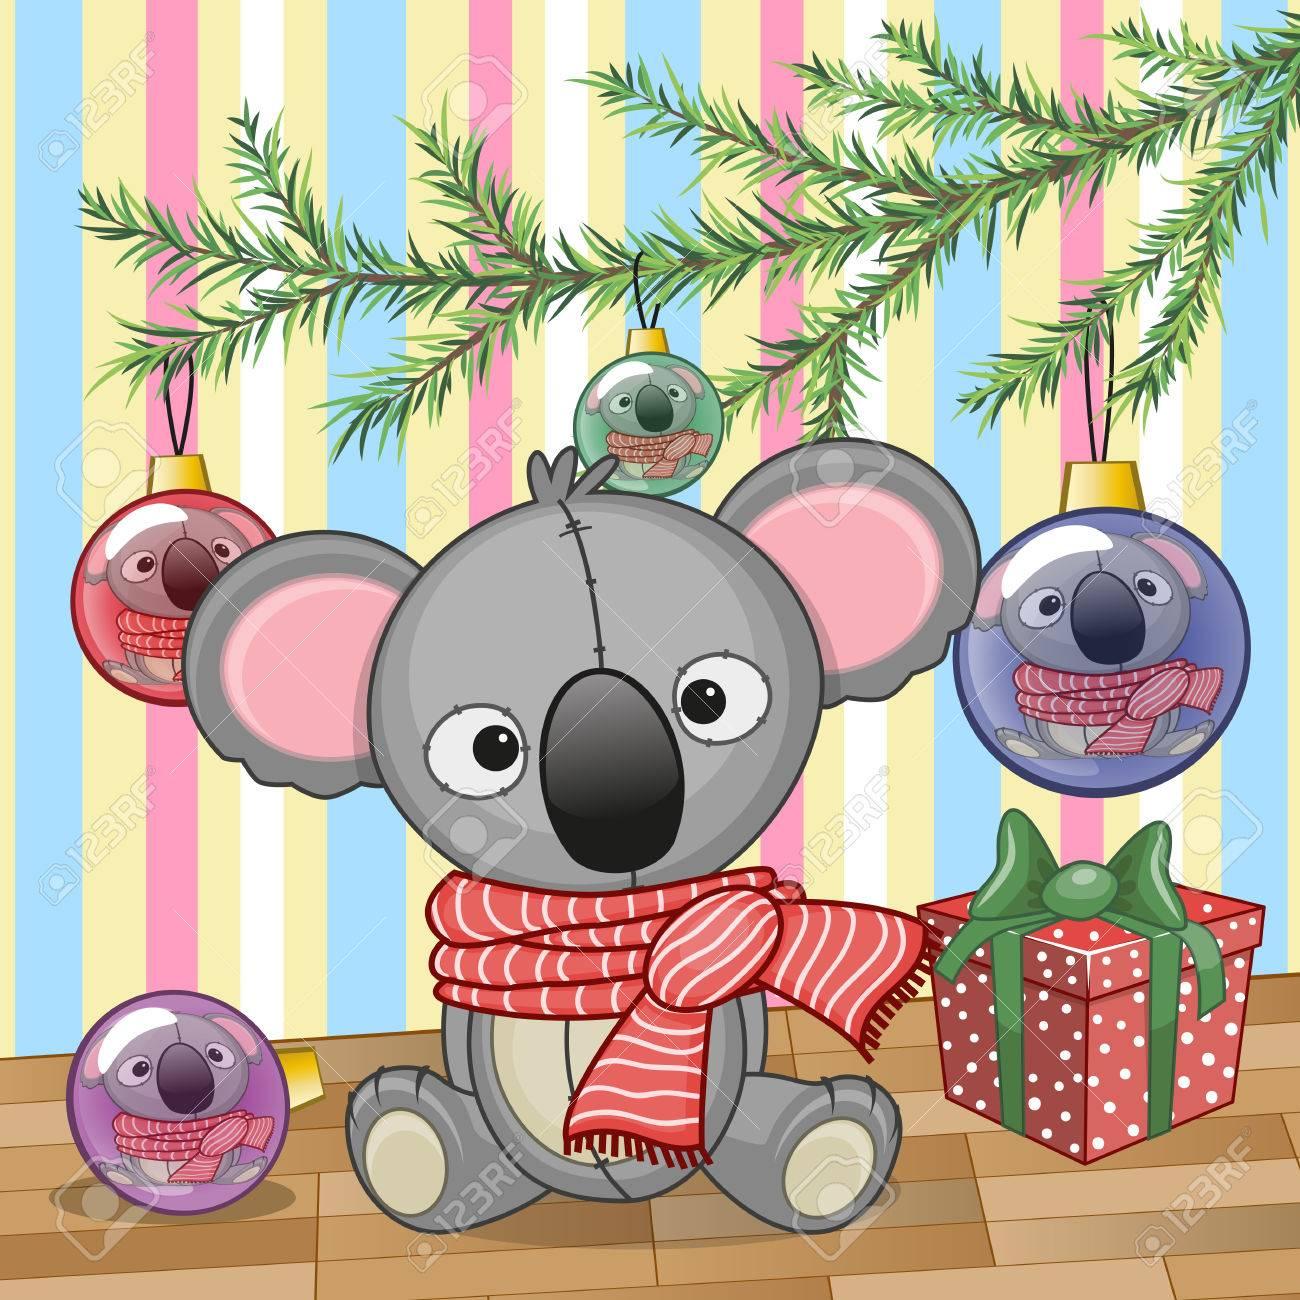 Cute Koala under the Christmas tree.